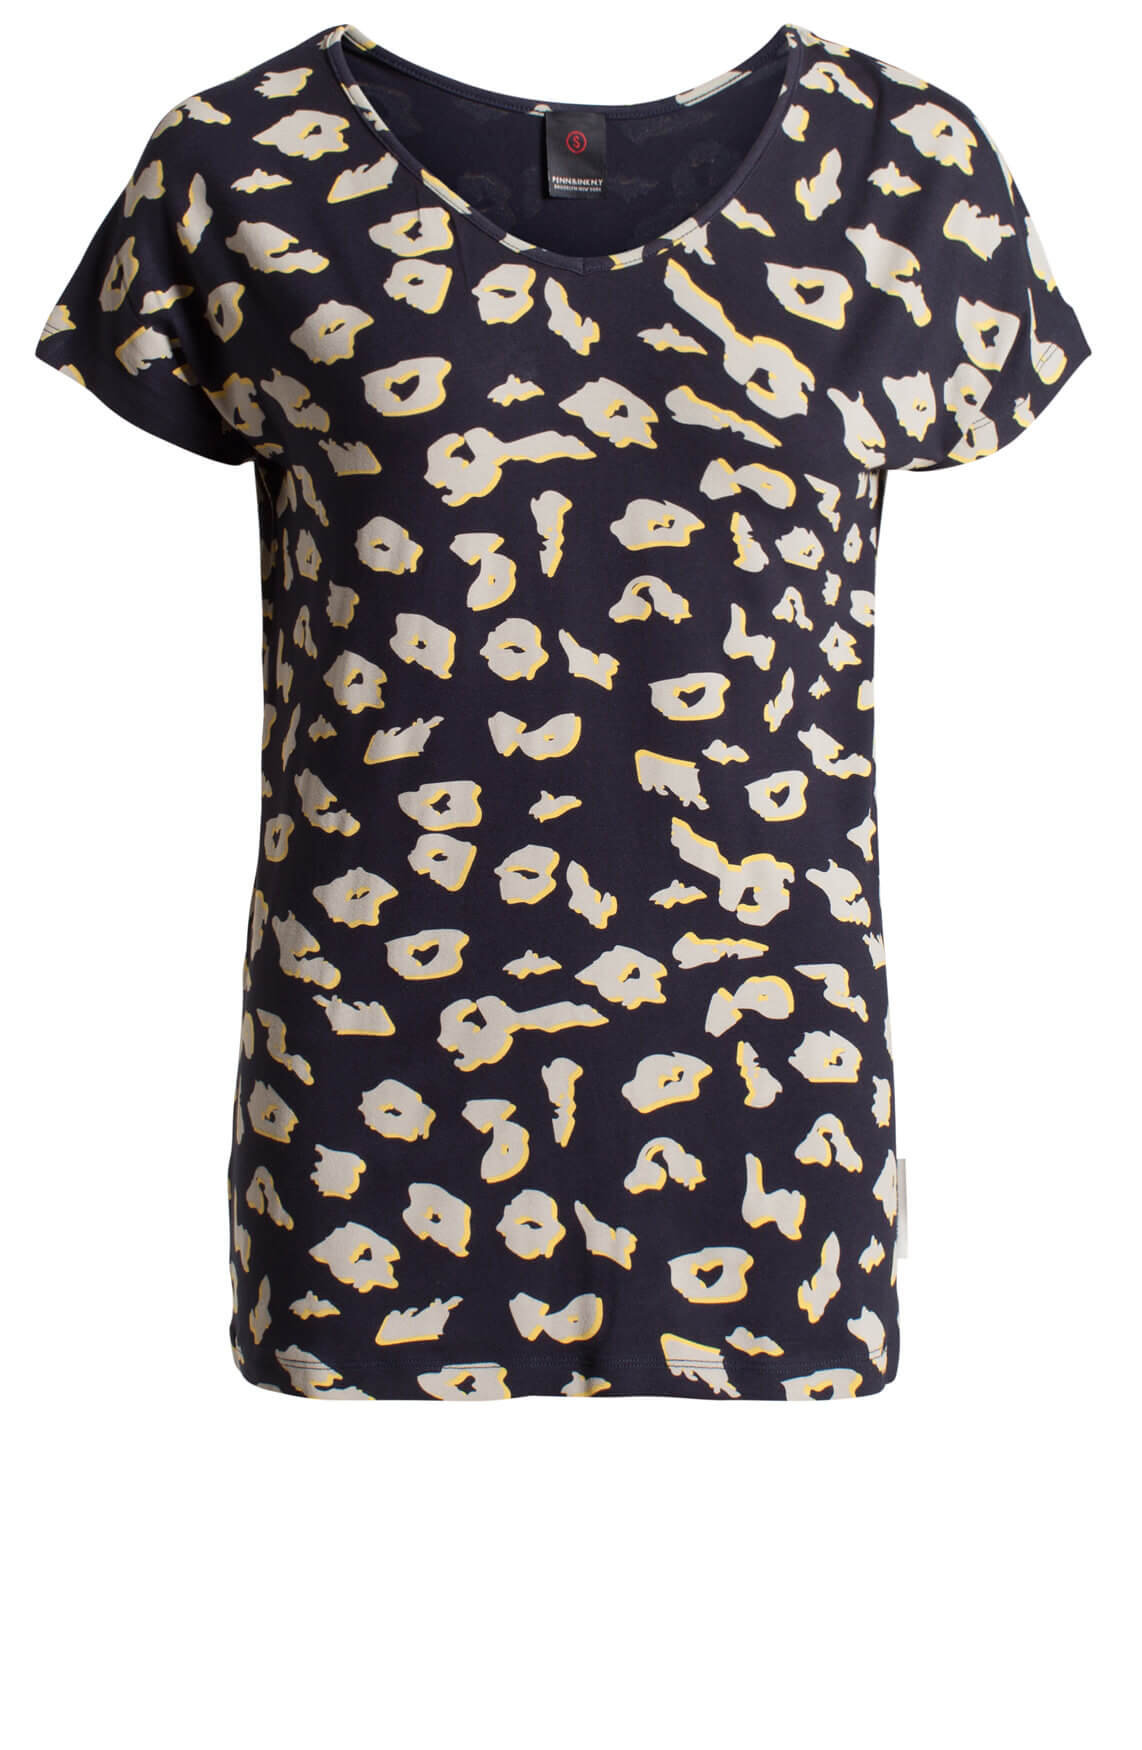 Penn & Ink Dames Shirt met print Blauw